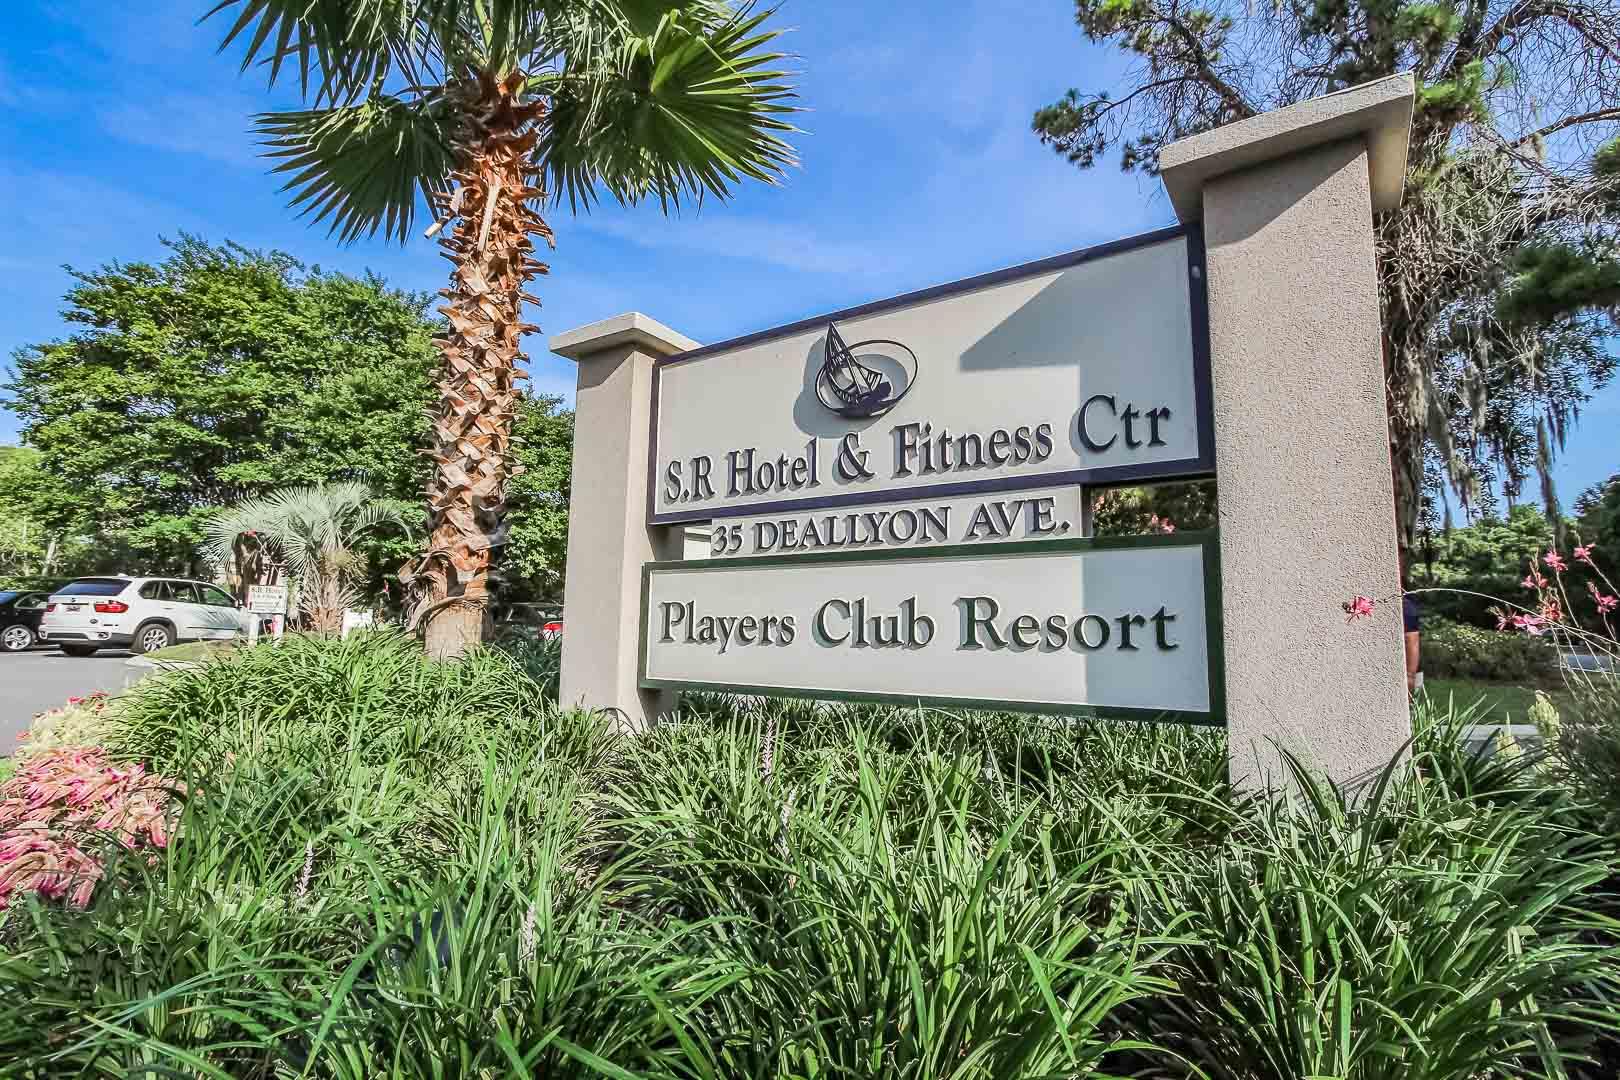 A welcoming resort signage at VRI's Players Club Resort in Hilton Head Island, South Carolina.